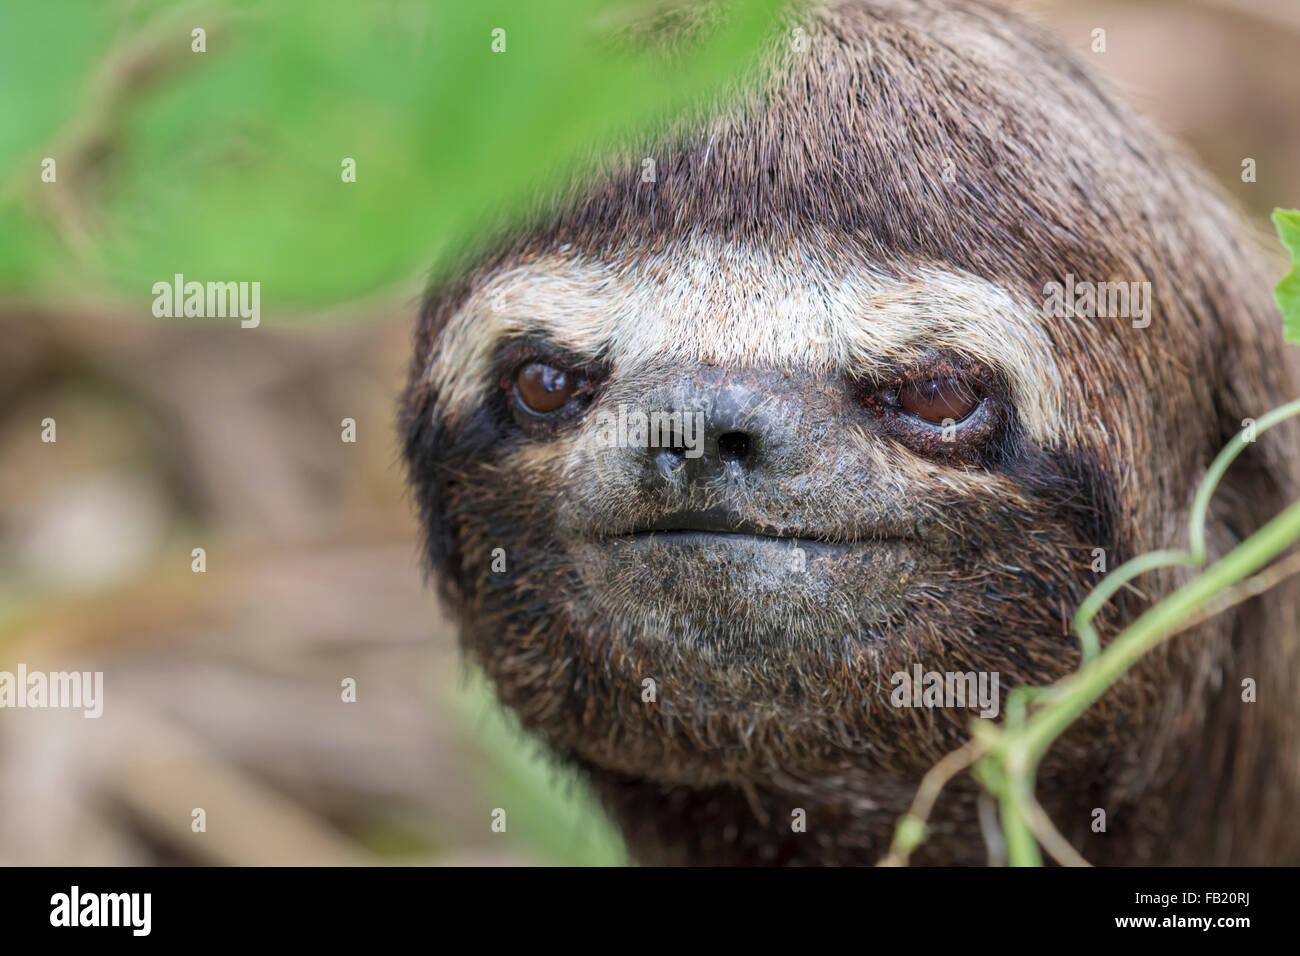 Brown-throated three-toed Sloth (Bradypus variegatus) portrait, Pacaya Samiria National Reserve, Yanayacu River, Peru Stock Photo